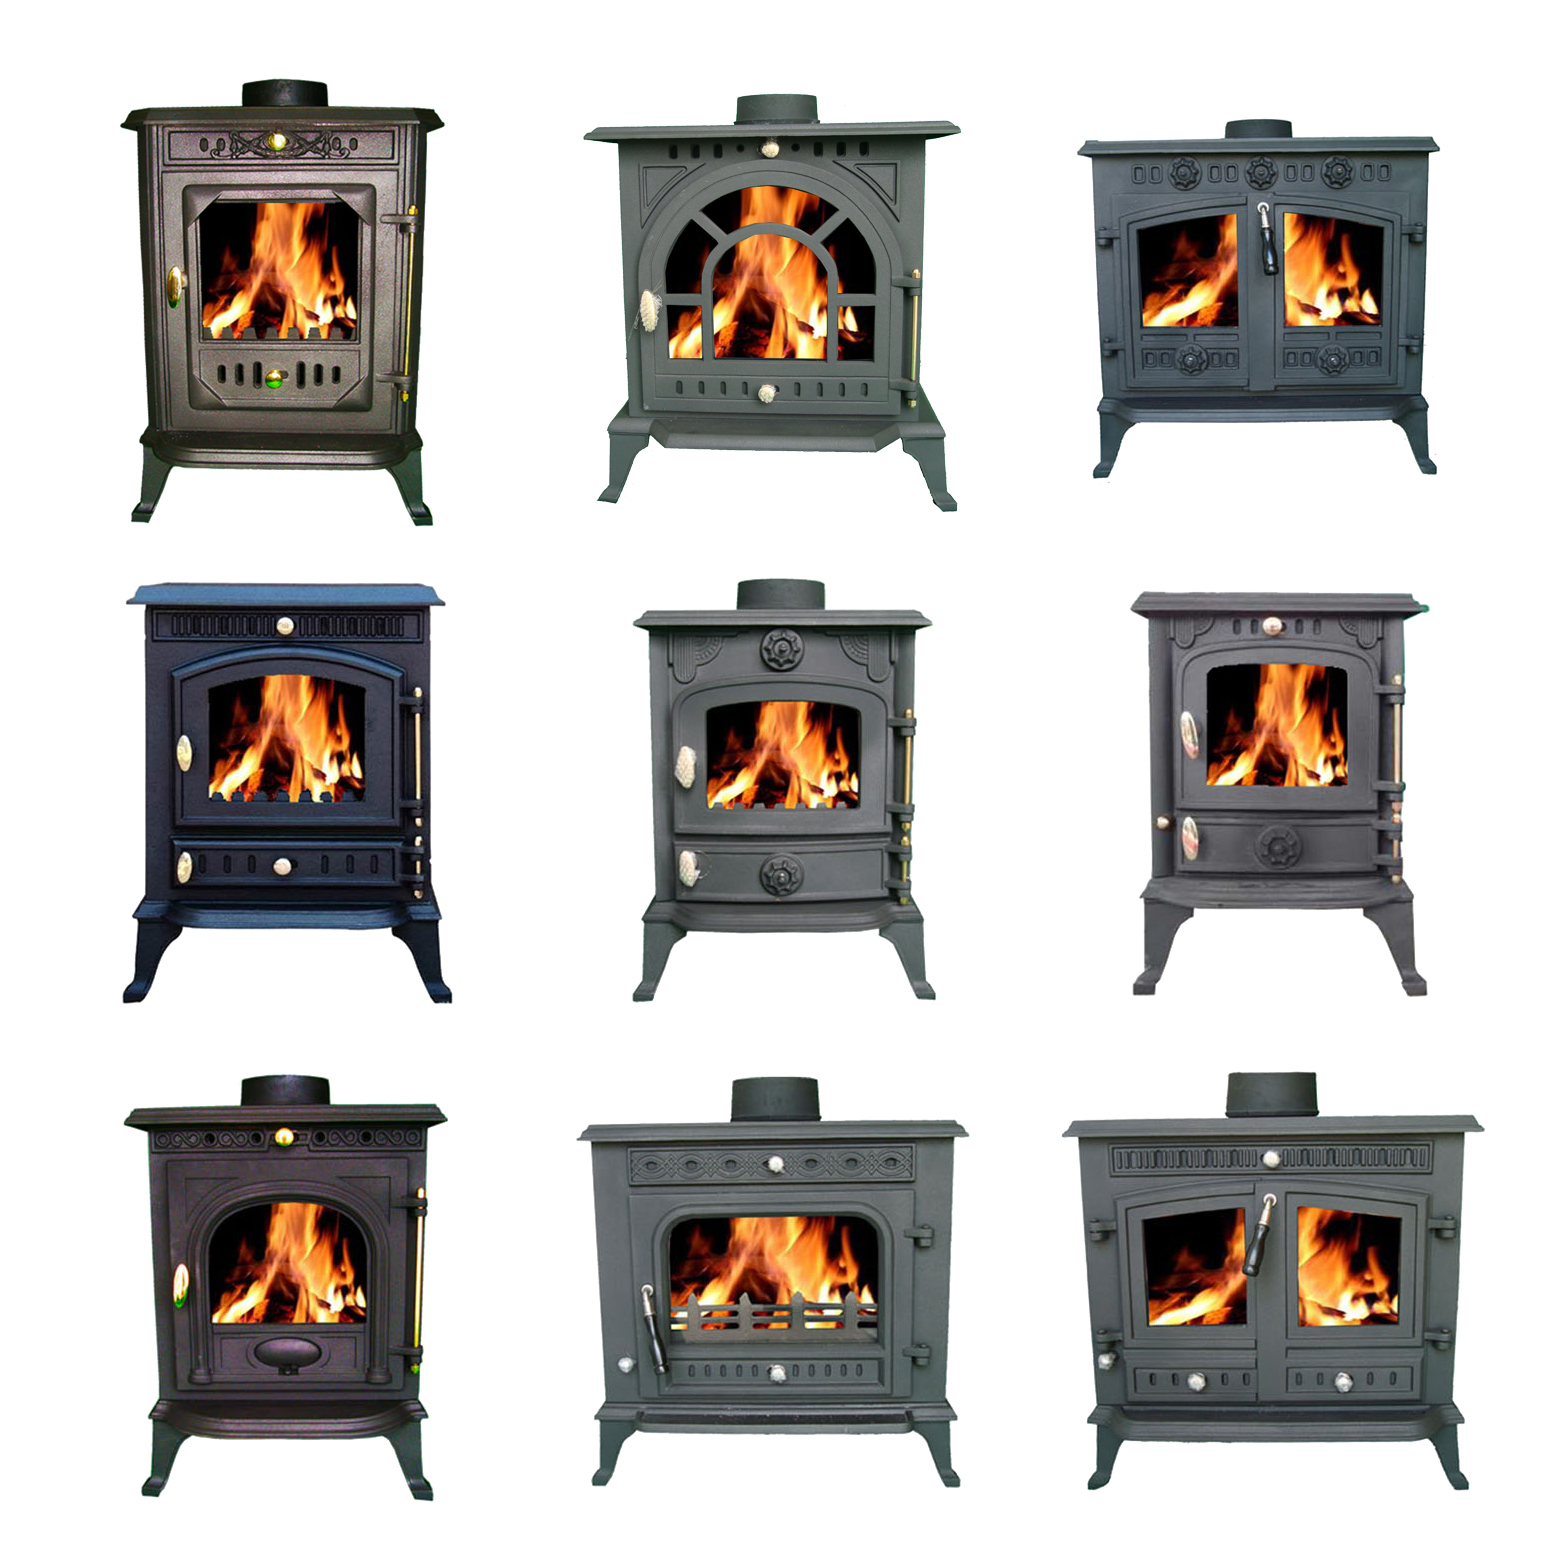 foxhunter cast iron log burner multifuel wood burning stove